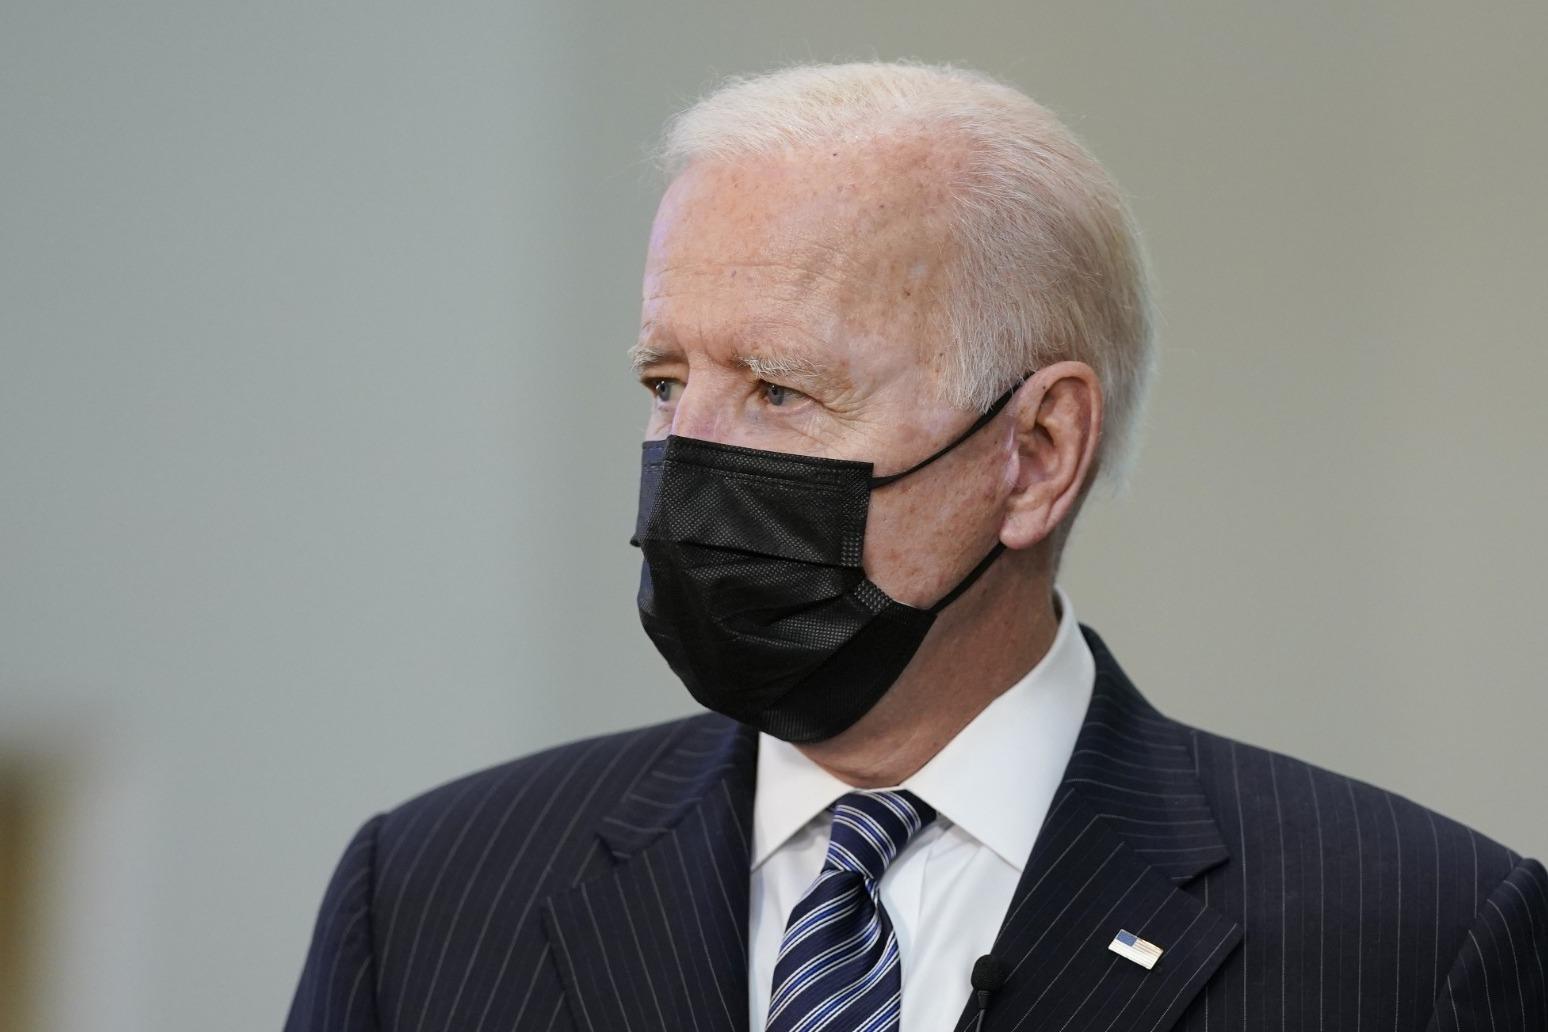 Joe Biden to host George Floyd's family at White House